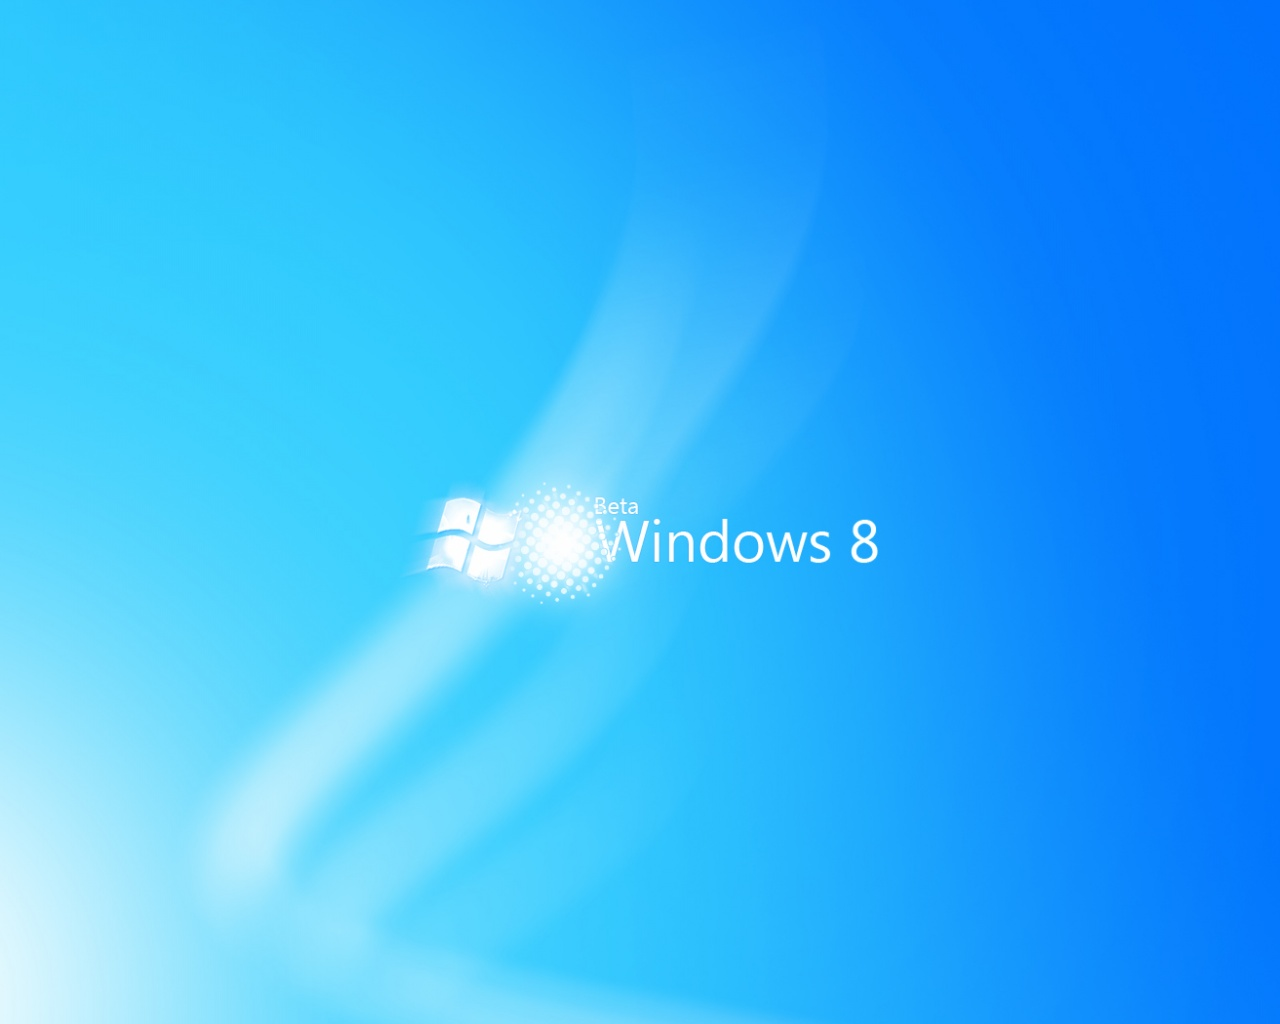 1280x1024 Windows 8 beta desktop PC and Mac wallpaper 1280x1024